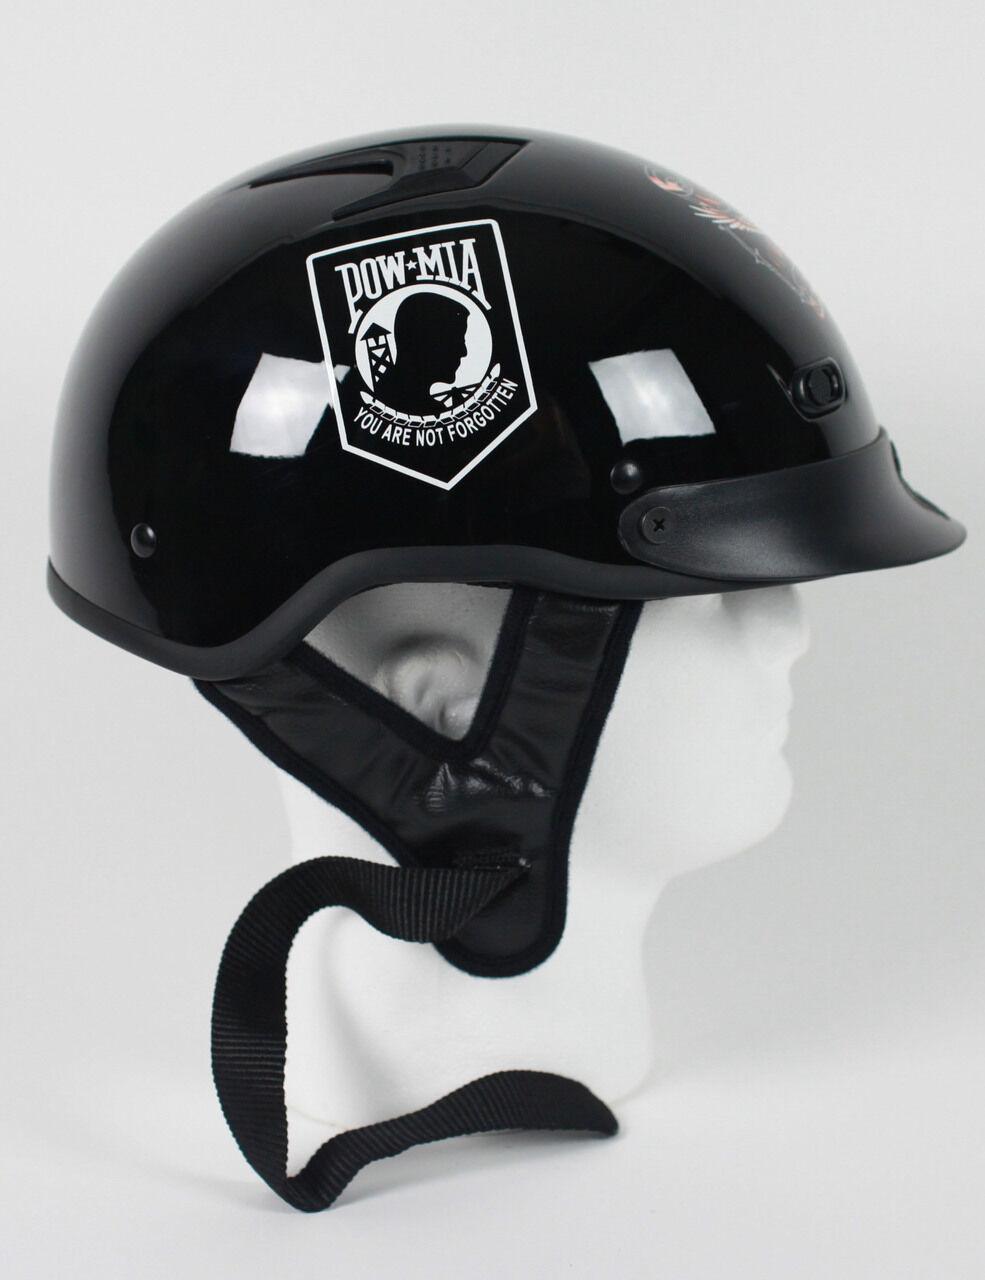 D.o.t. ventilados POW MIA casco de motocicleta Medio casco Beanie Shorty Encendedor Nuevo